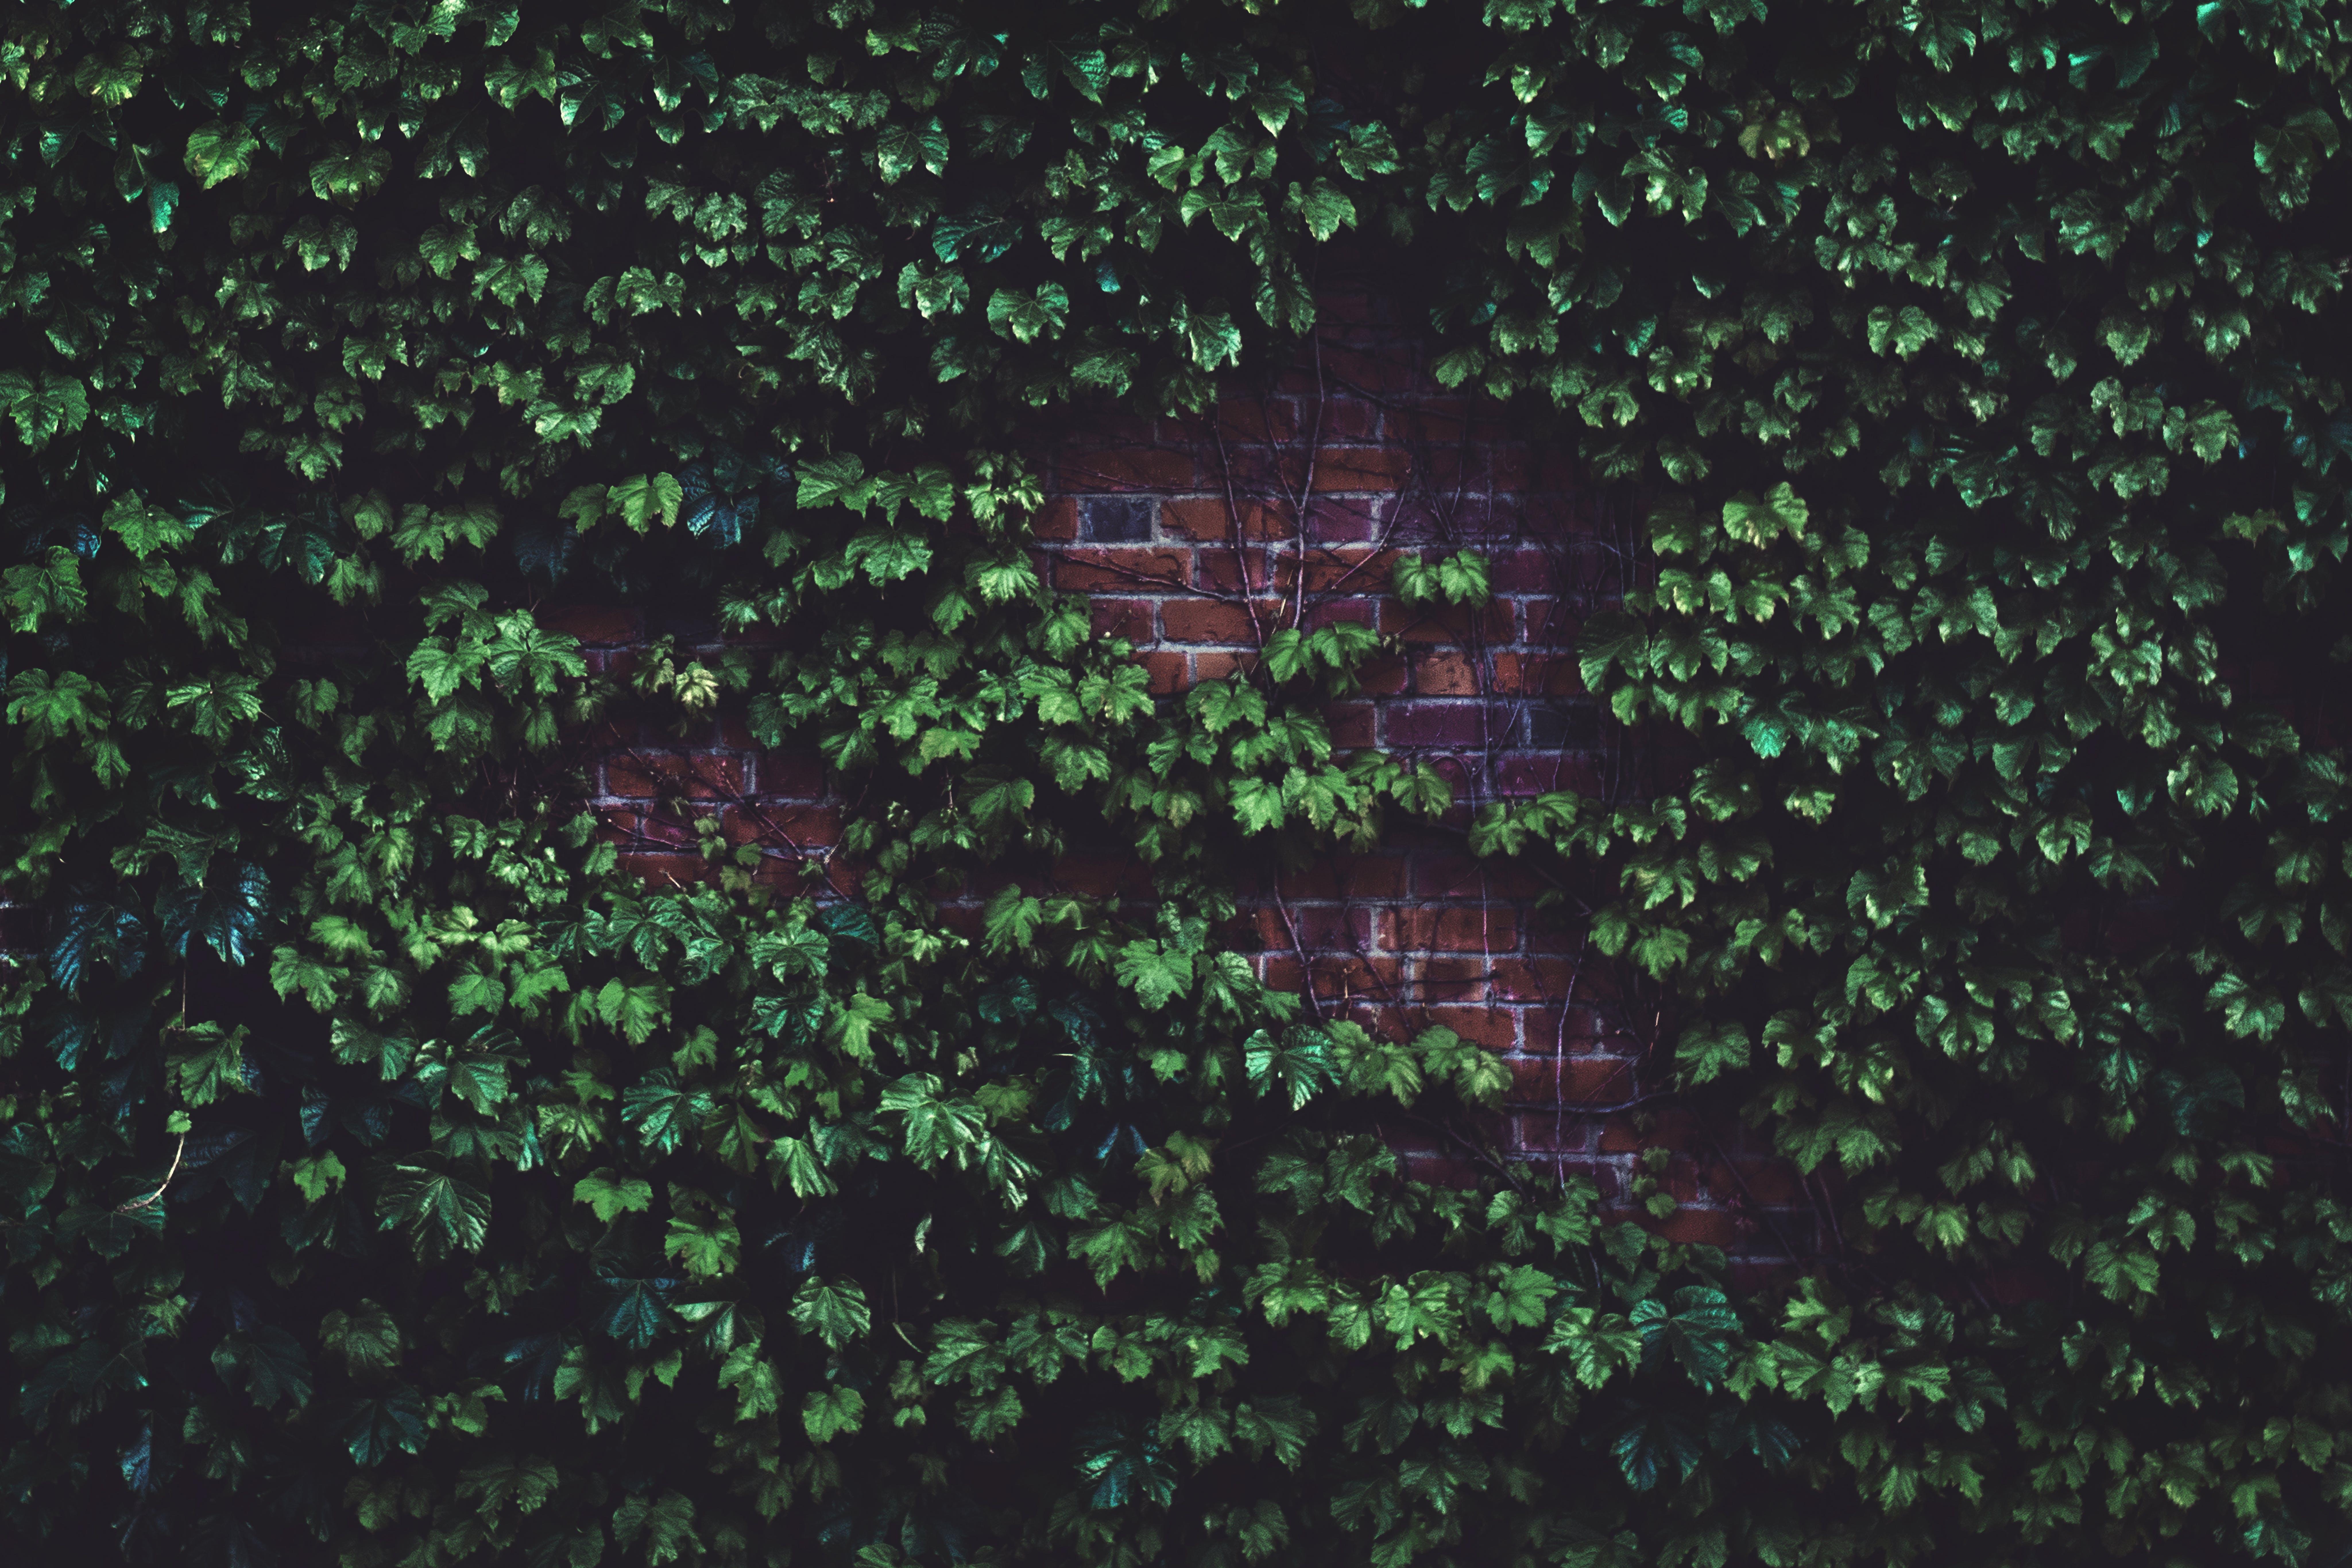 Green Plants in Wall Bricks at Daytime